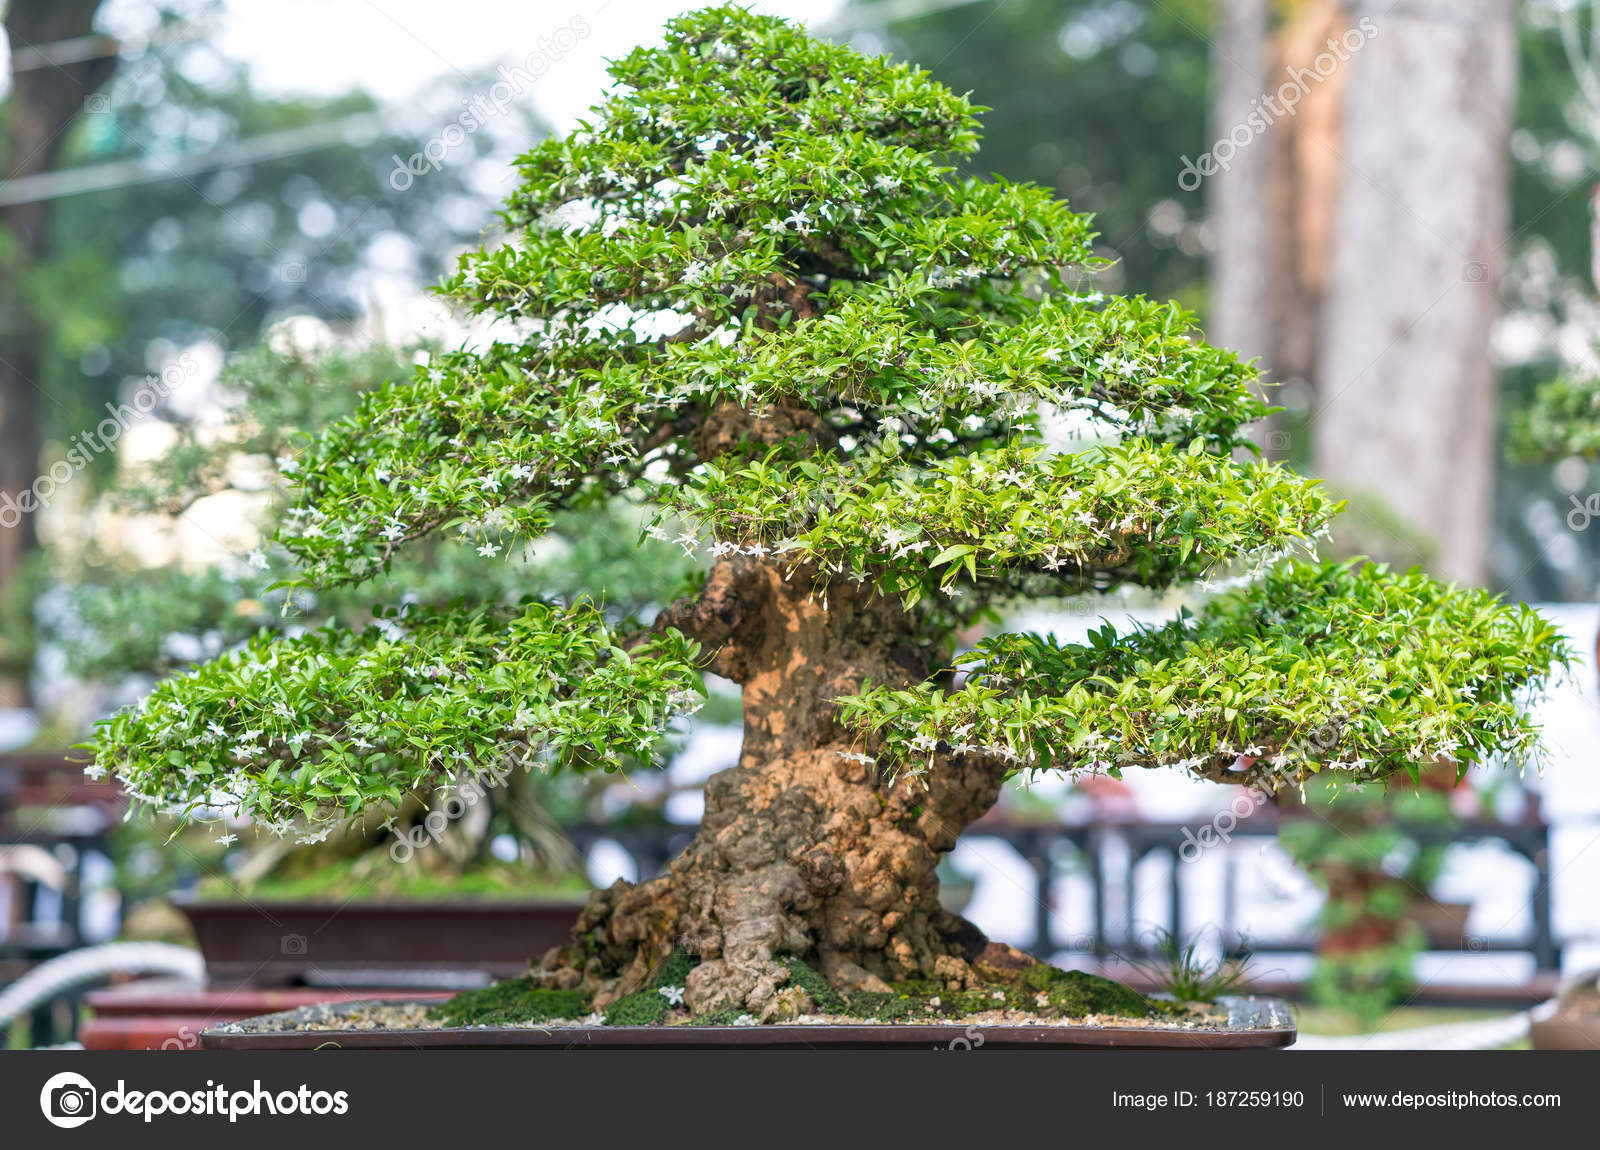 Groene Bonsai Boom Een Pot Lade Plant Vorm Van Stam Stockfoto C Huythoai1978 Gmail Com 187259190